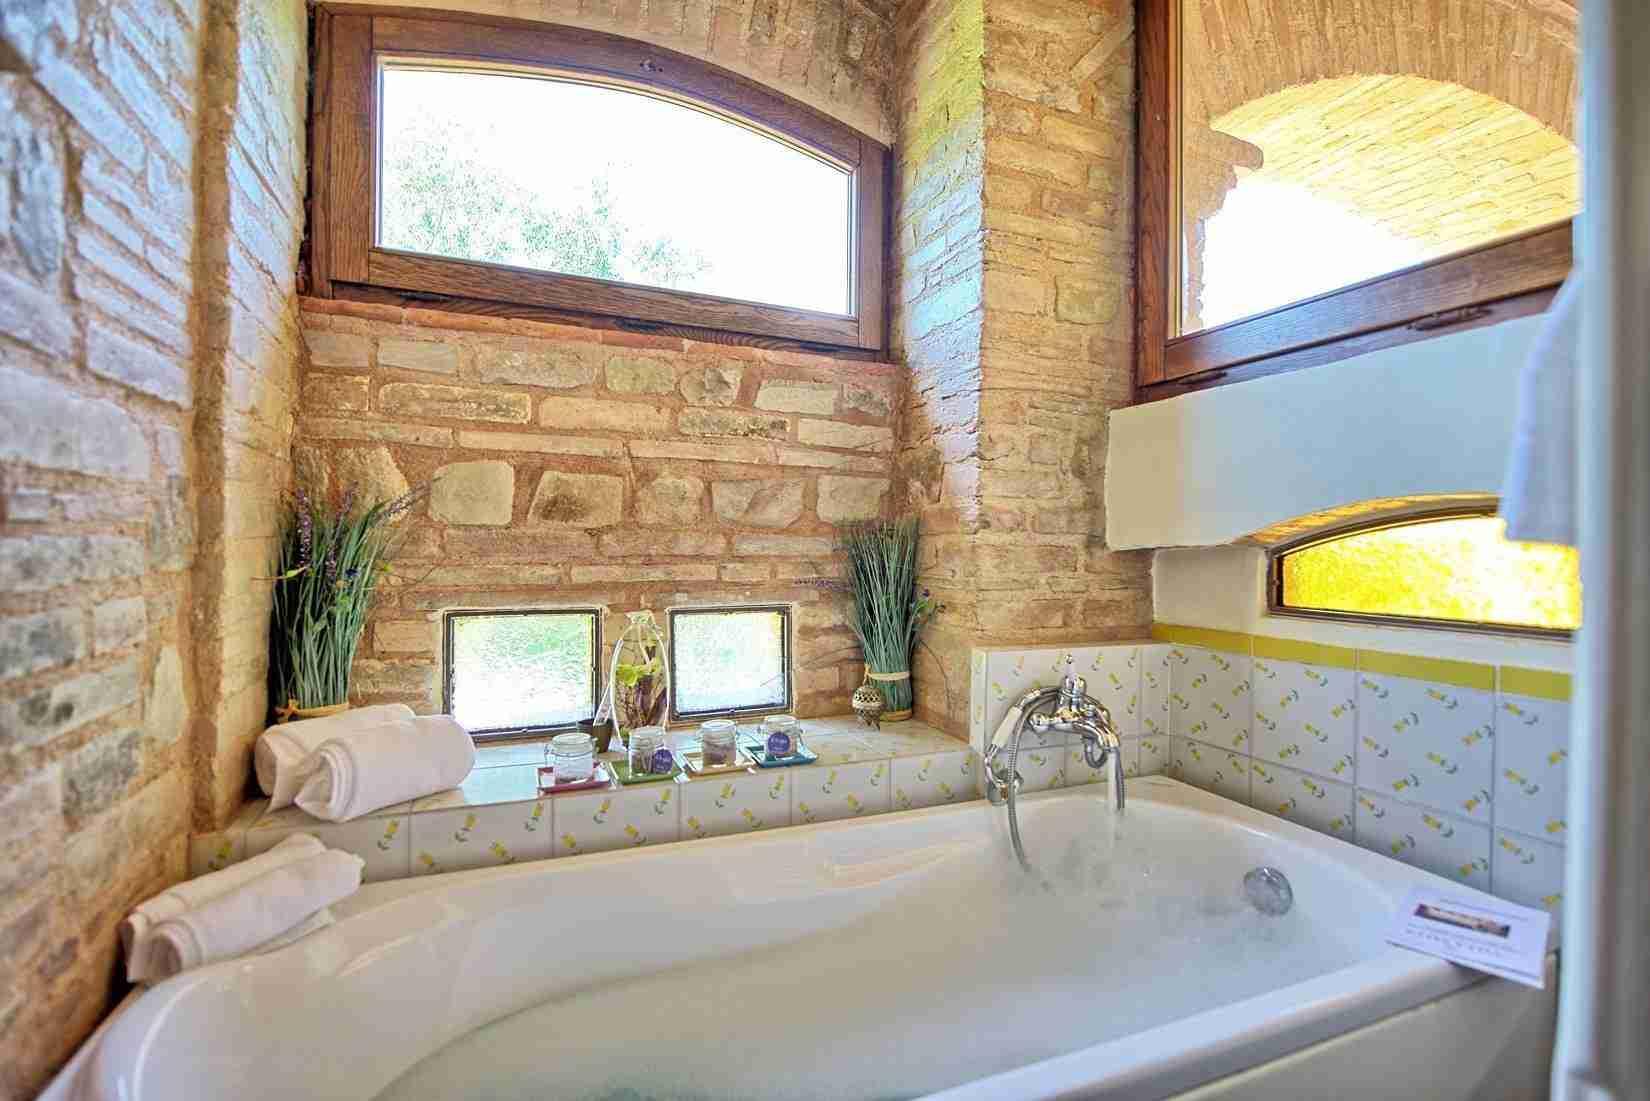 34 Assisi bath tub